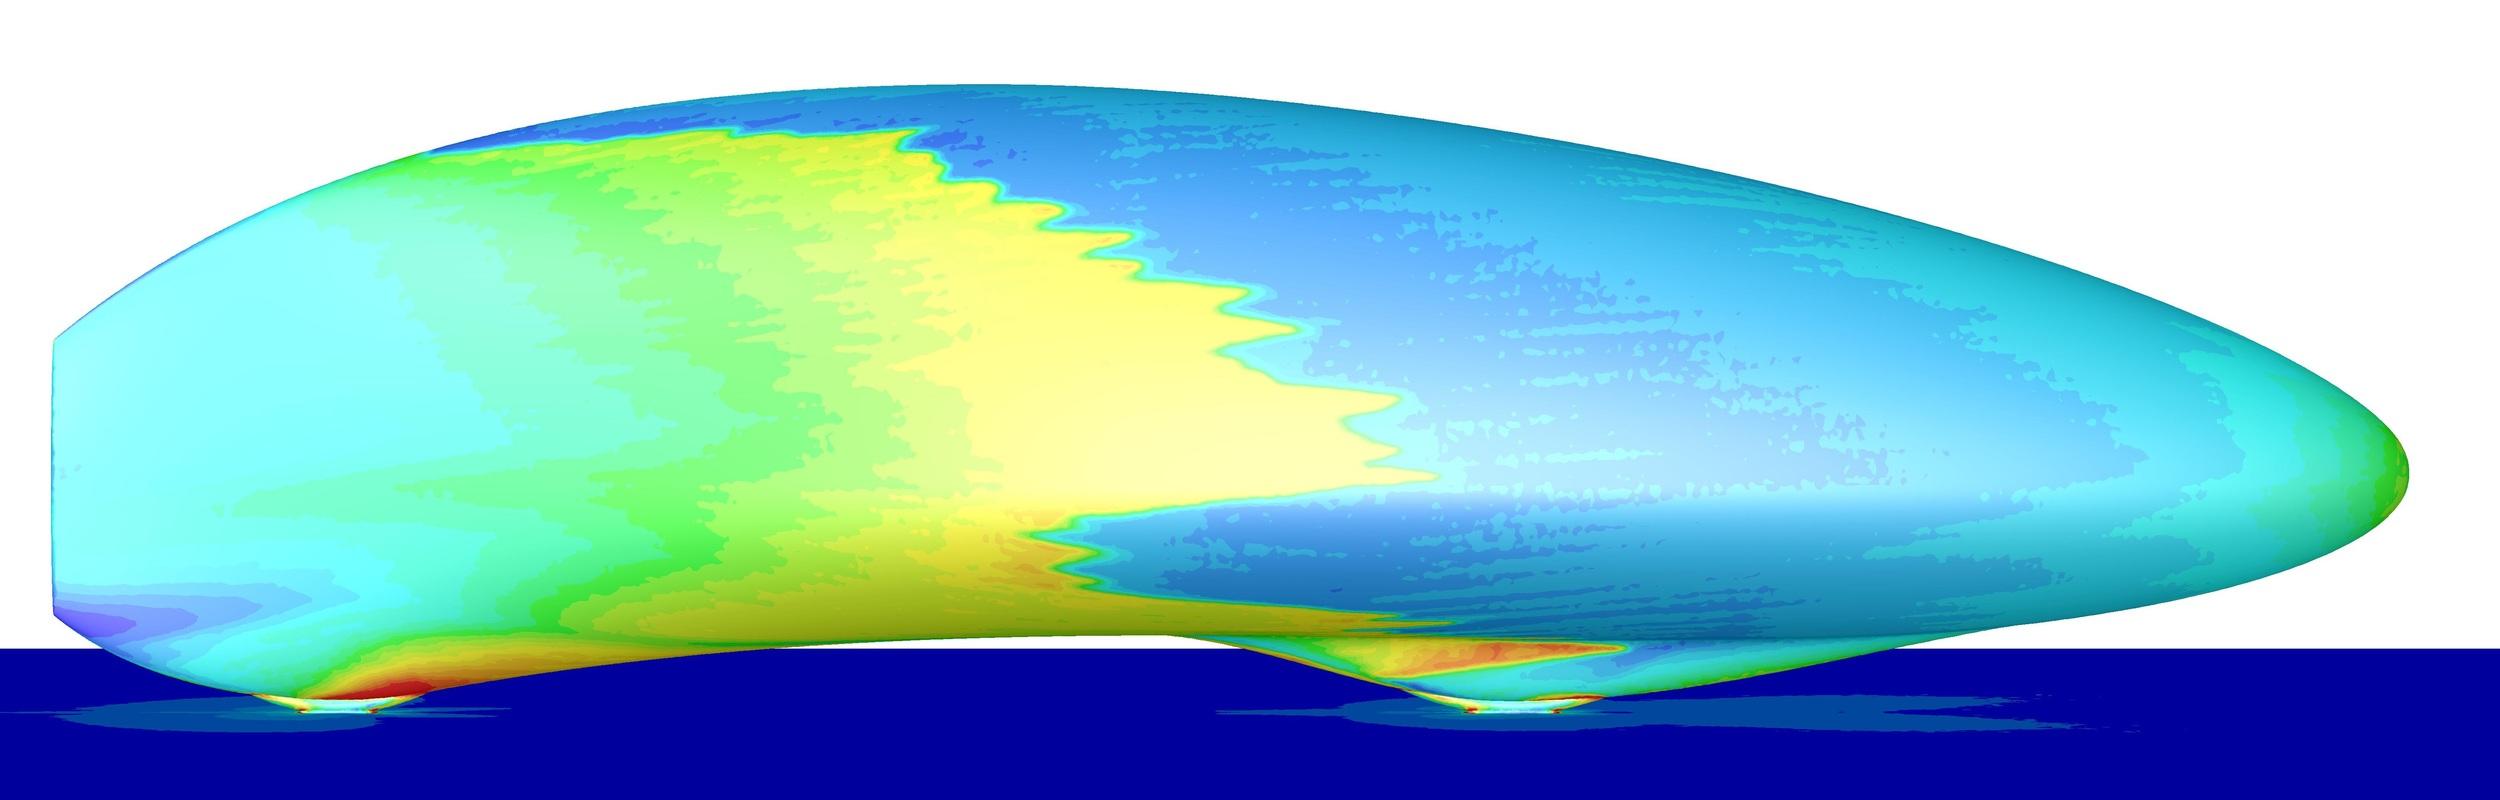 CFD analysis using SST laminar to turbulent flow transition model